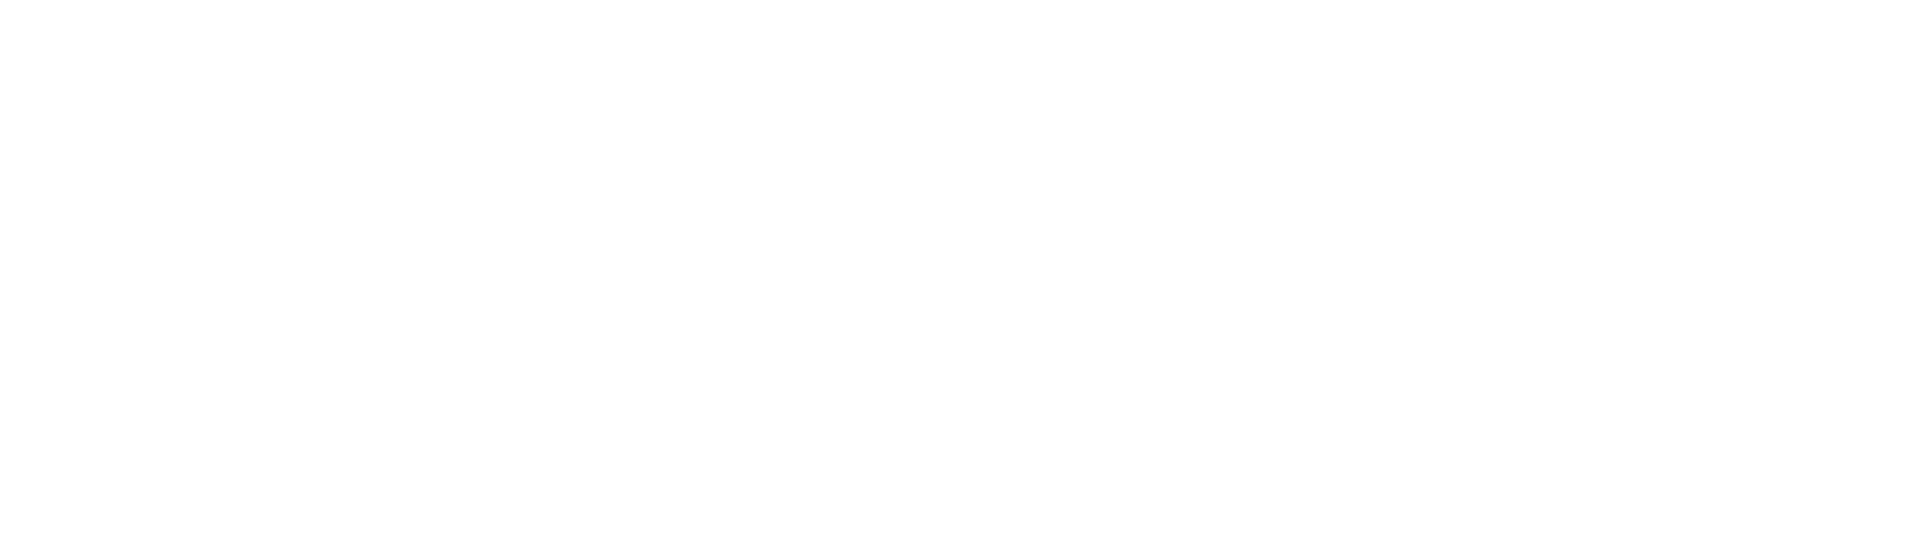 2014-2018 Dodge Ram 2500 Power Wagon 4